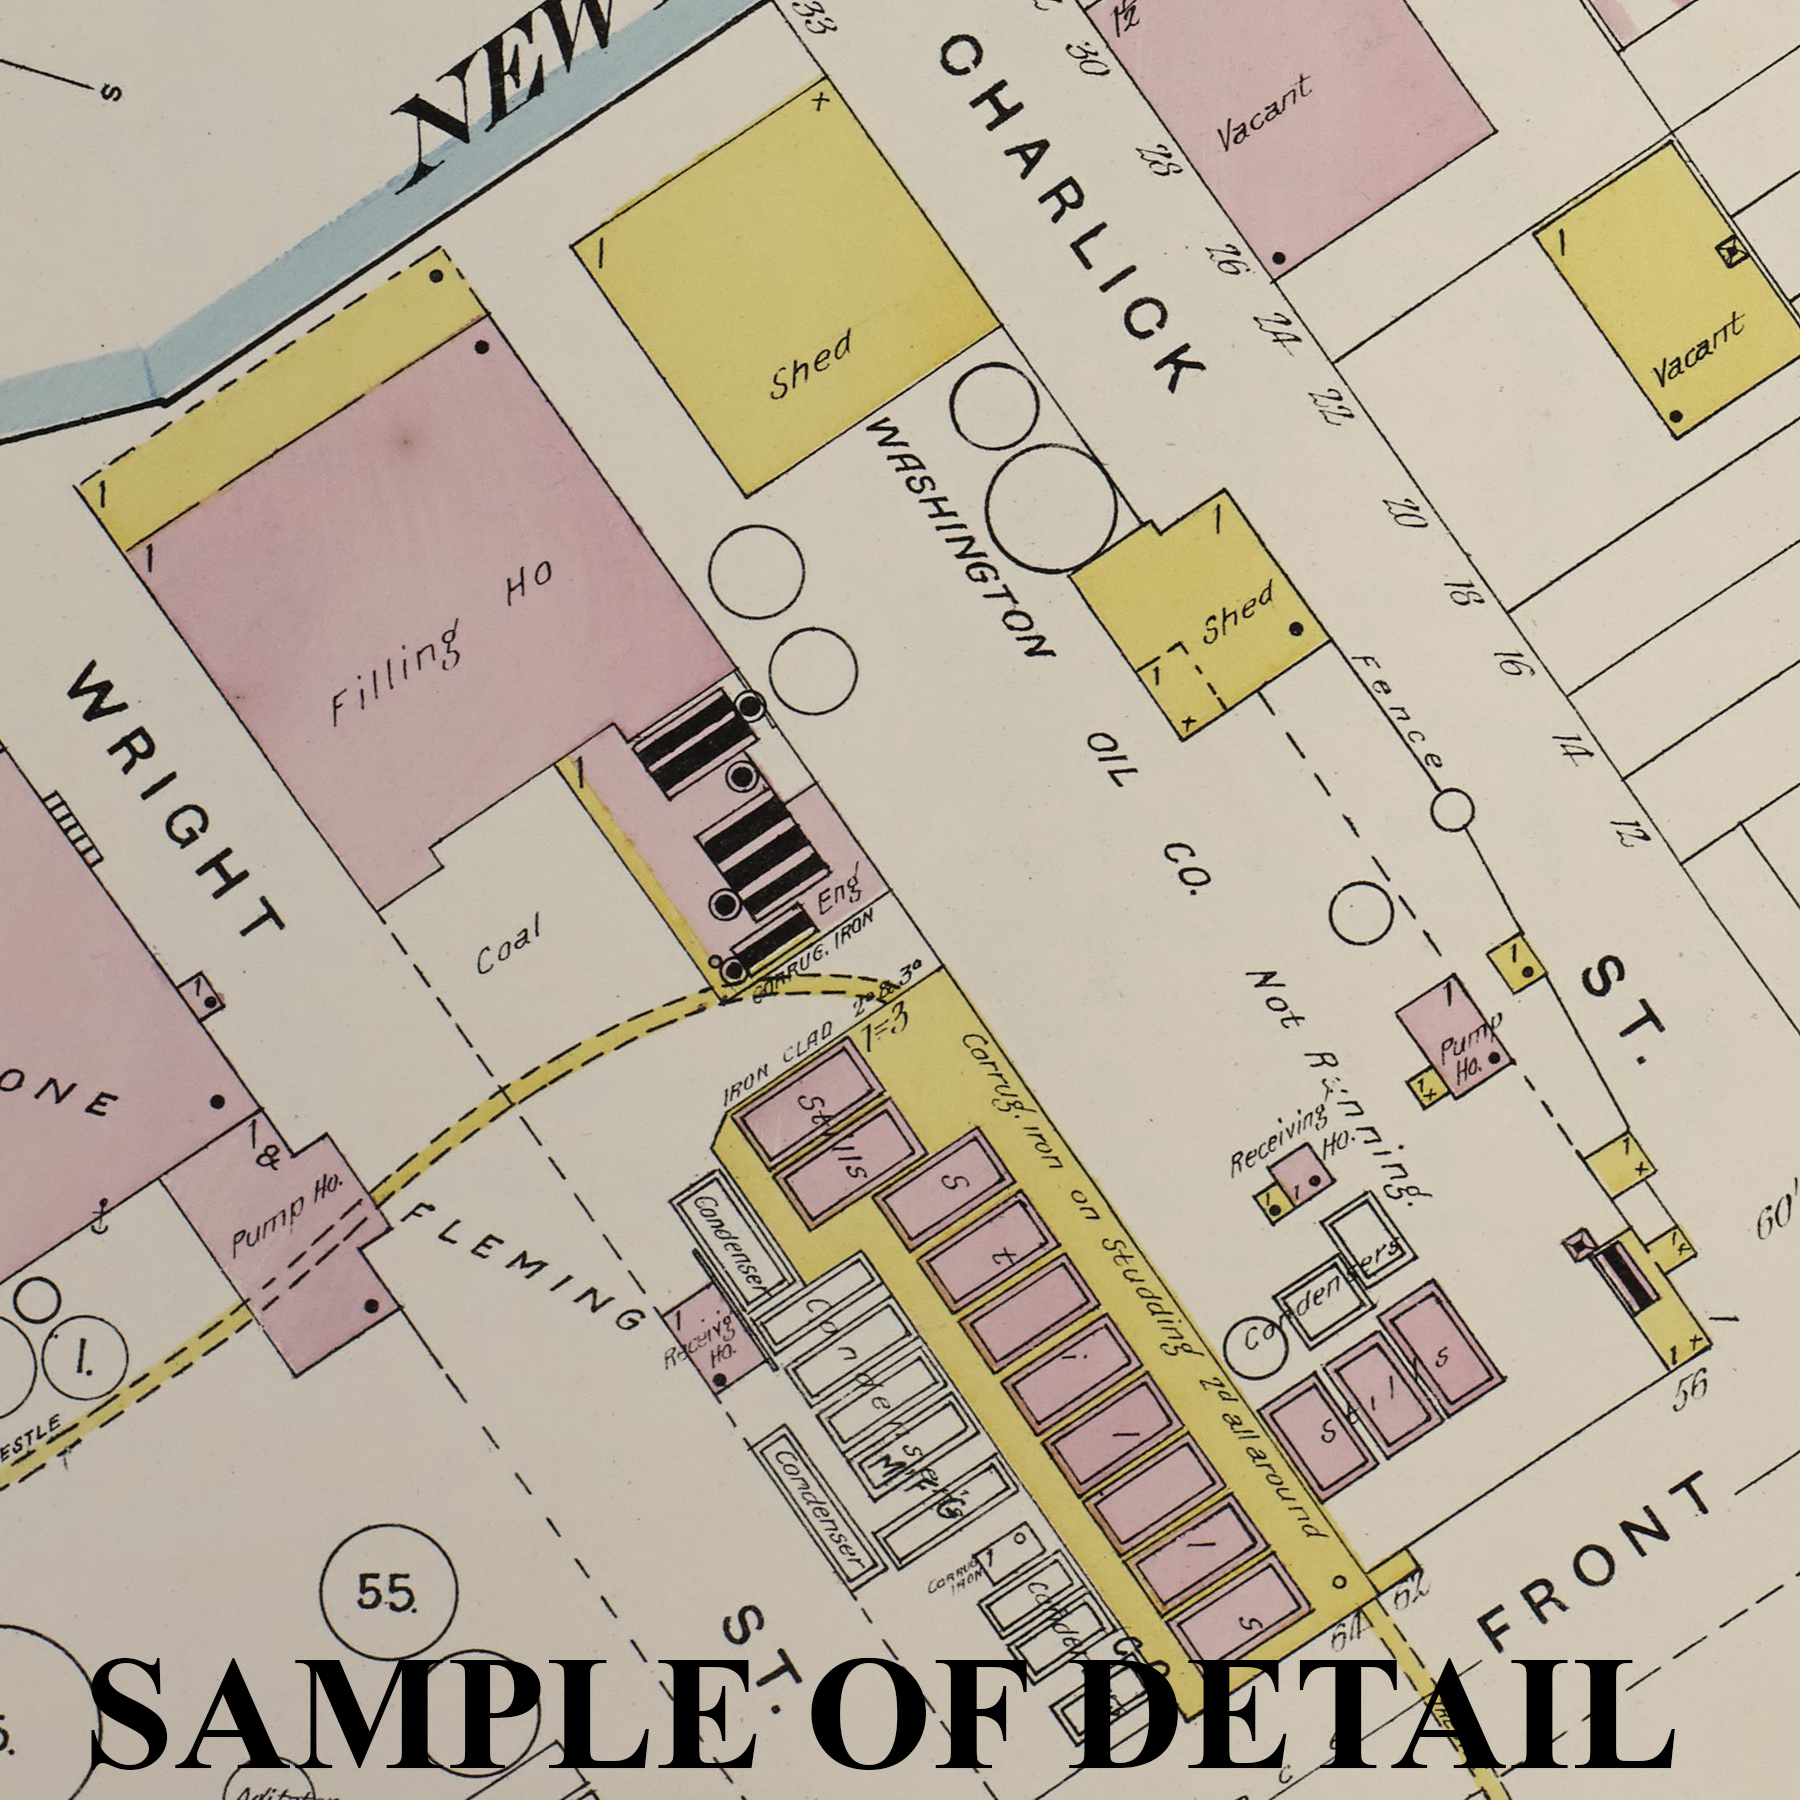 sample-05791-09-1888-0233l.jpg